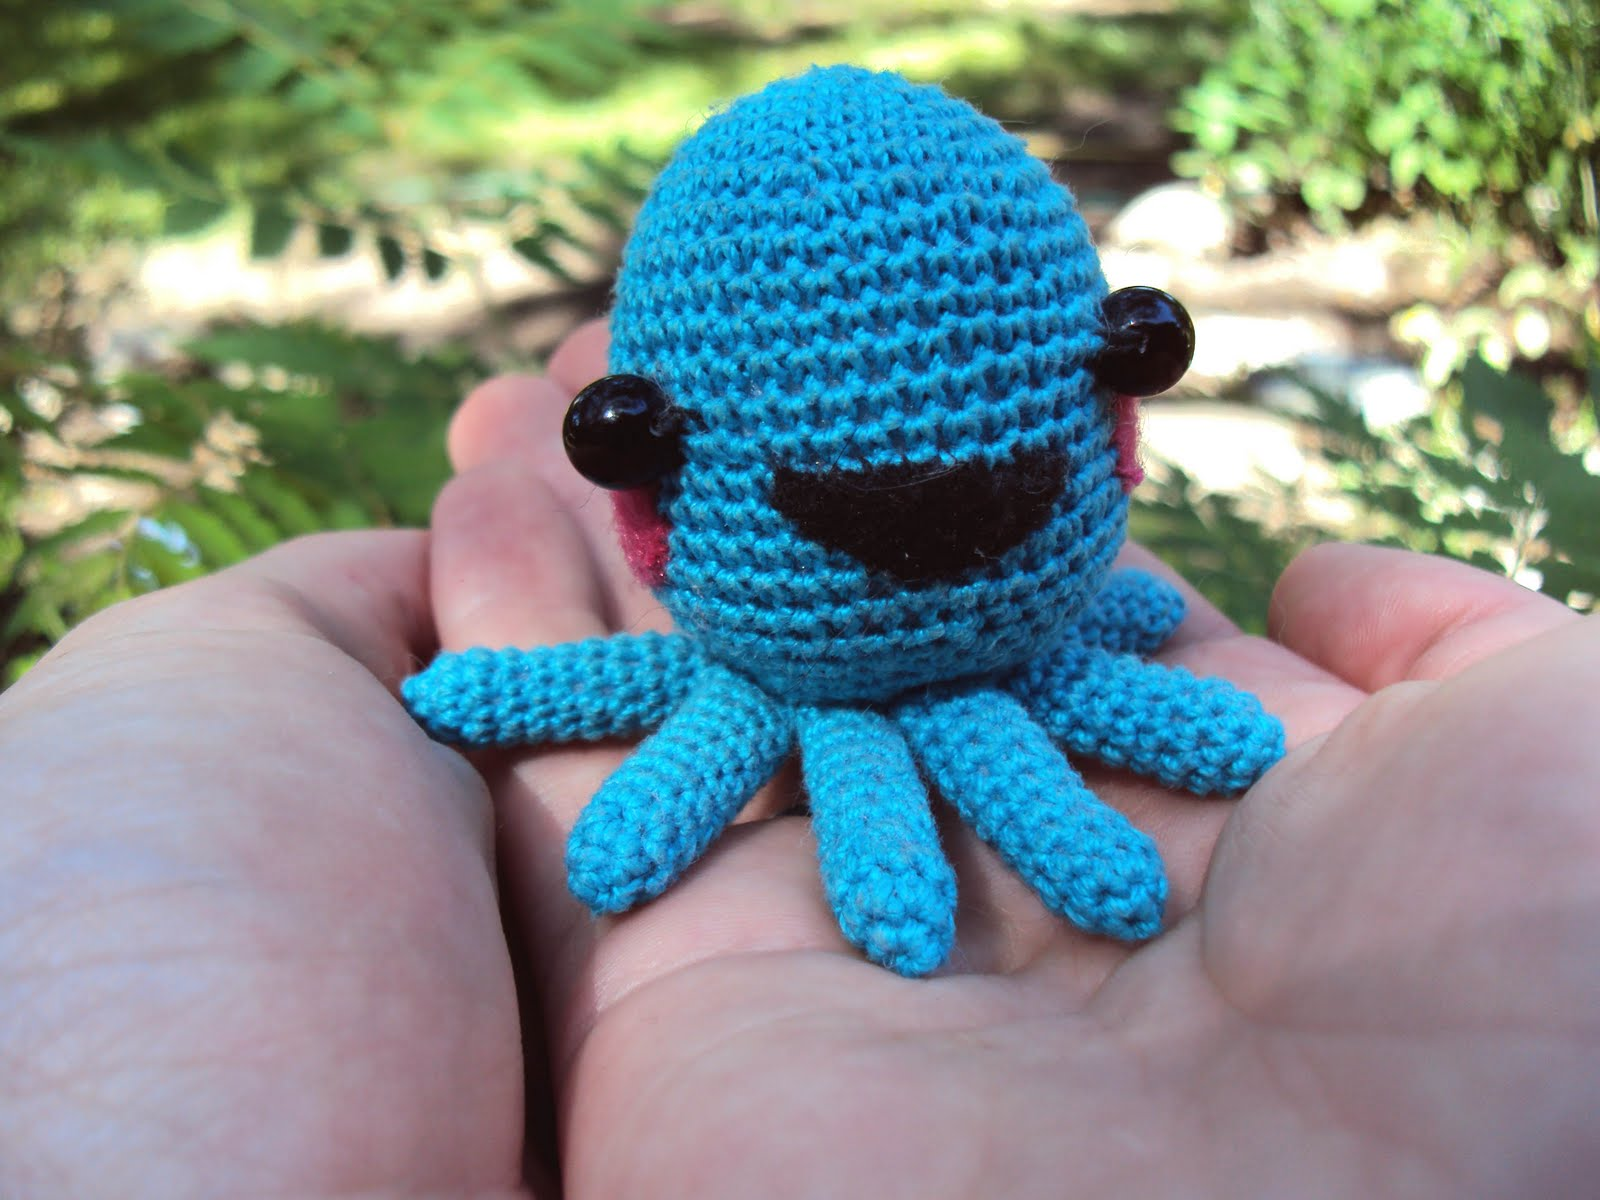 Amigurumi World Seriously Cute Crochet : Amigurumi World: Seriously Cute Crochet: Ana Paula Rimoli